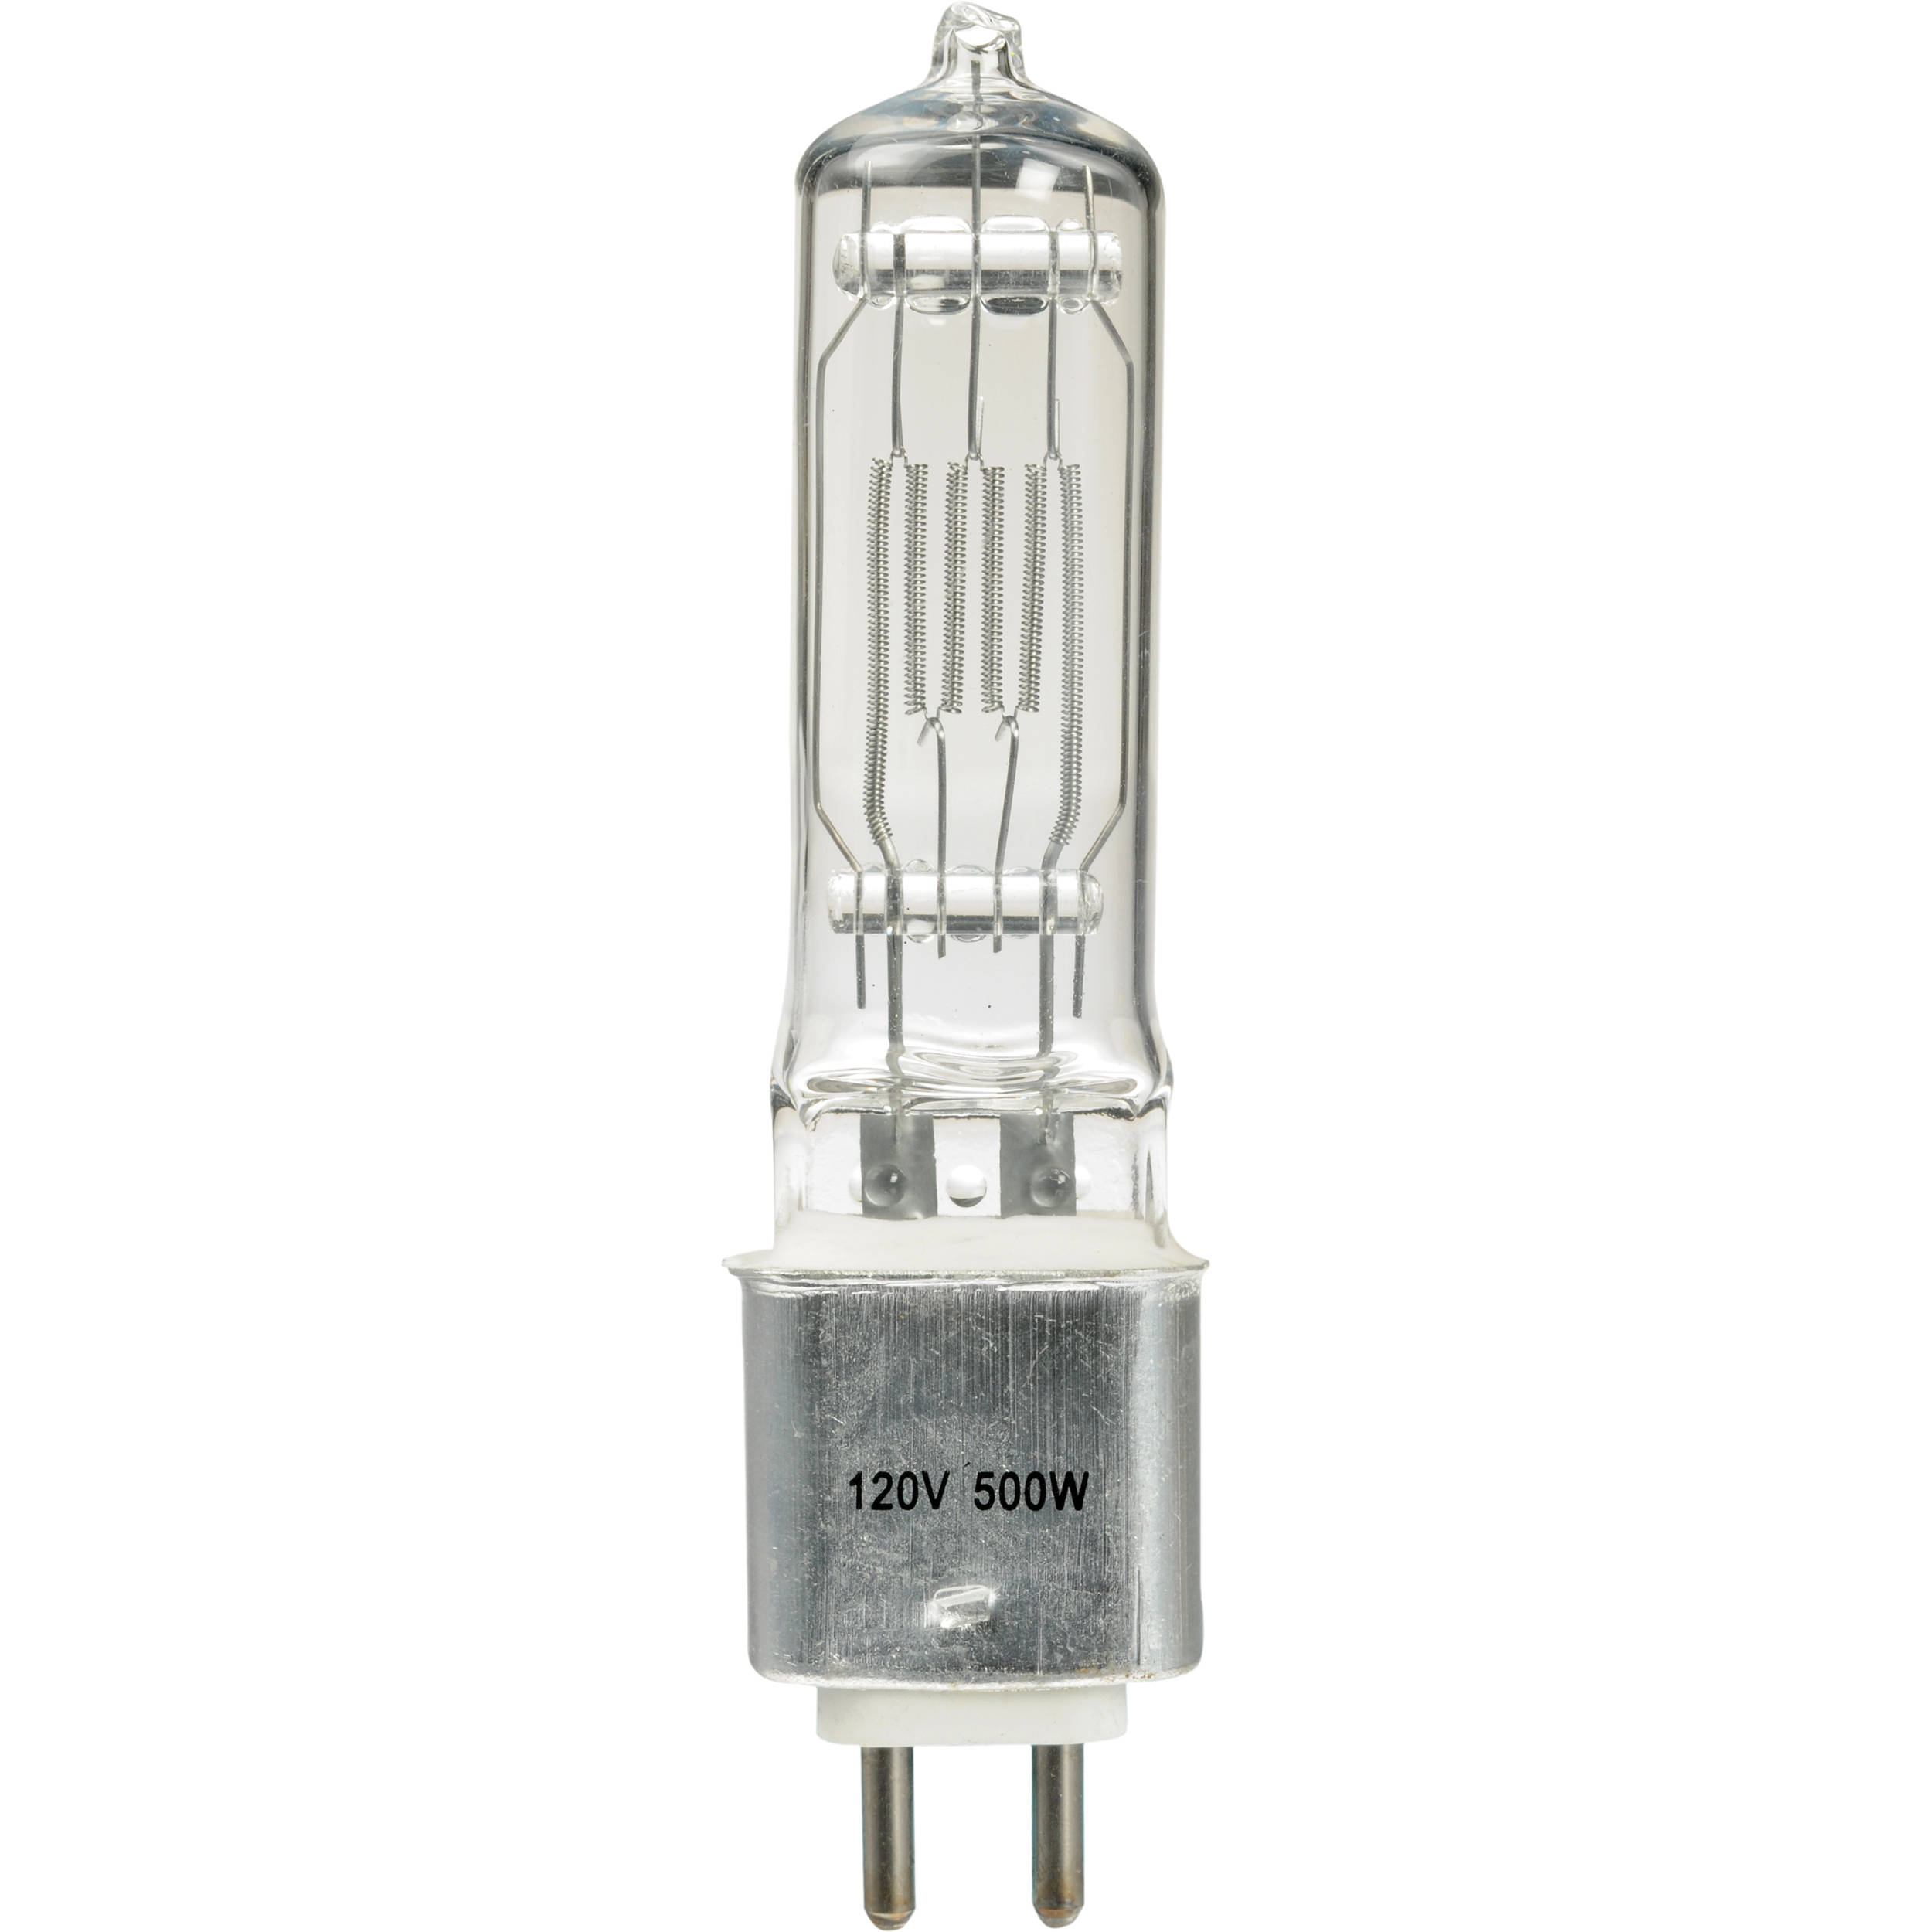 Savage Replacement Quartz 500w Light Bulb For M31500 Lighting Kit